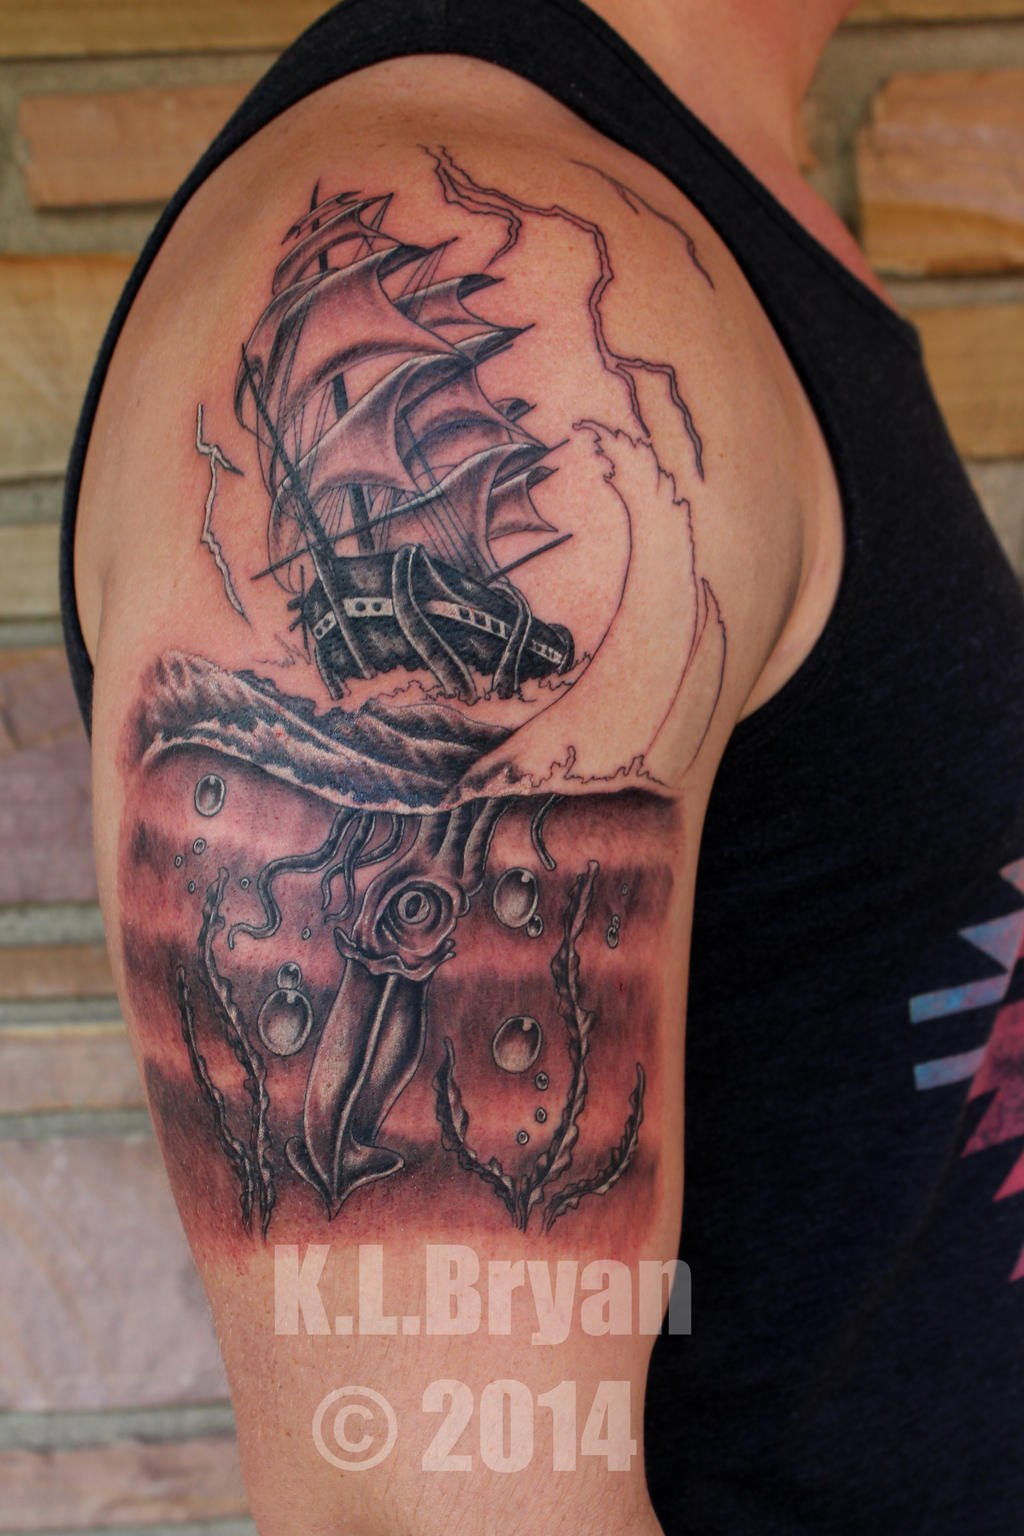 Kraken half sleeve tattoo 1st sitting by danktat on deviantart for 1 4 sleeve tattoo